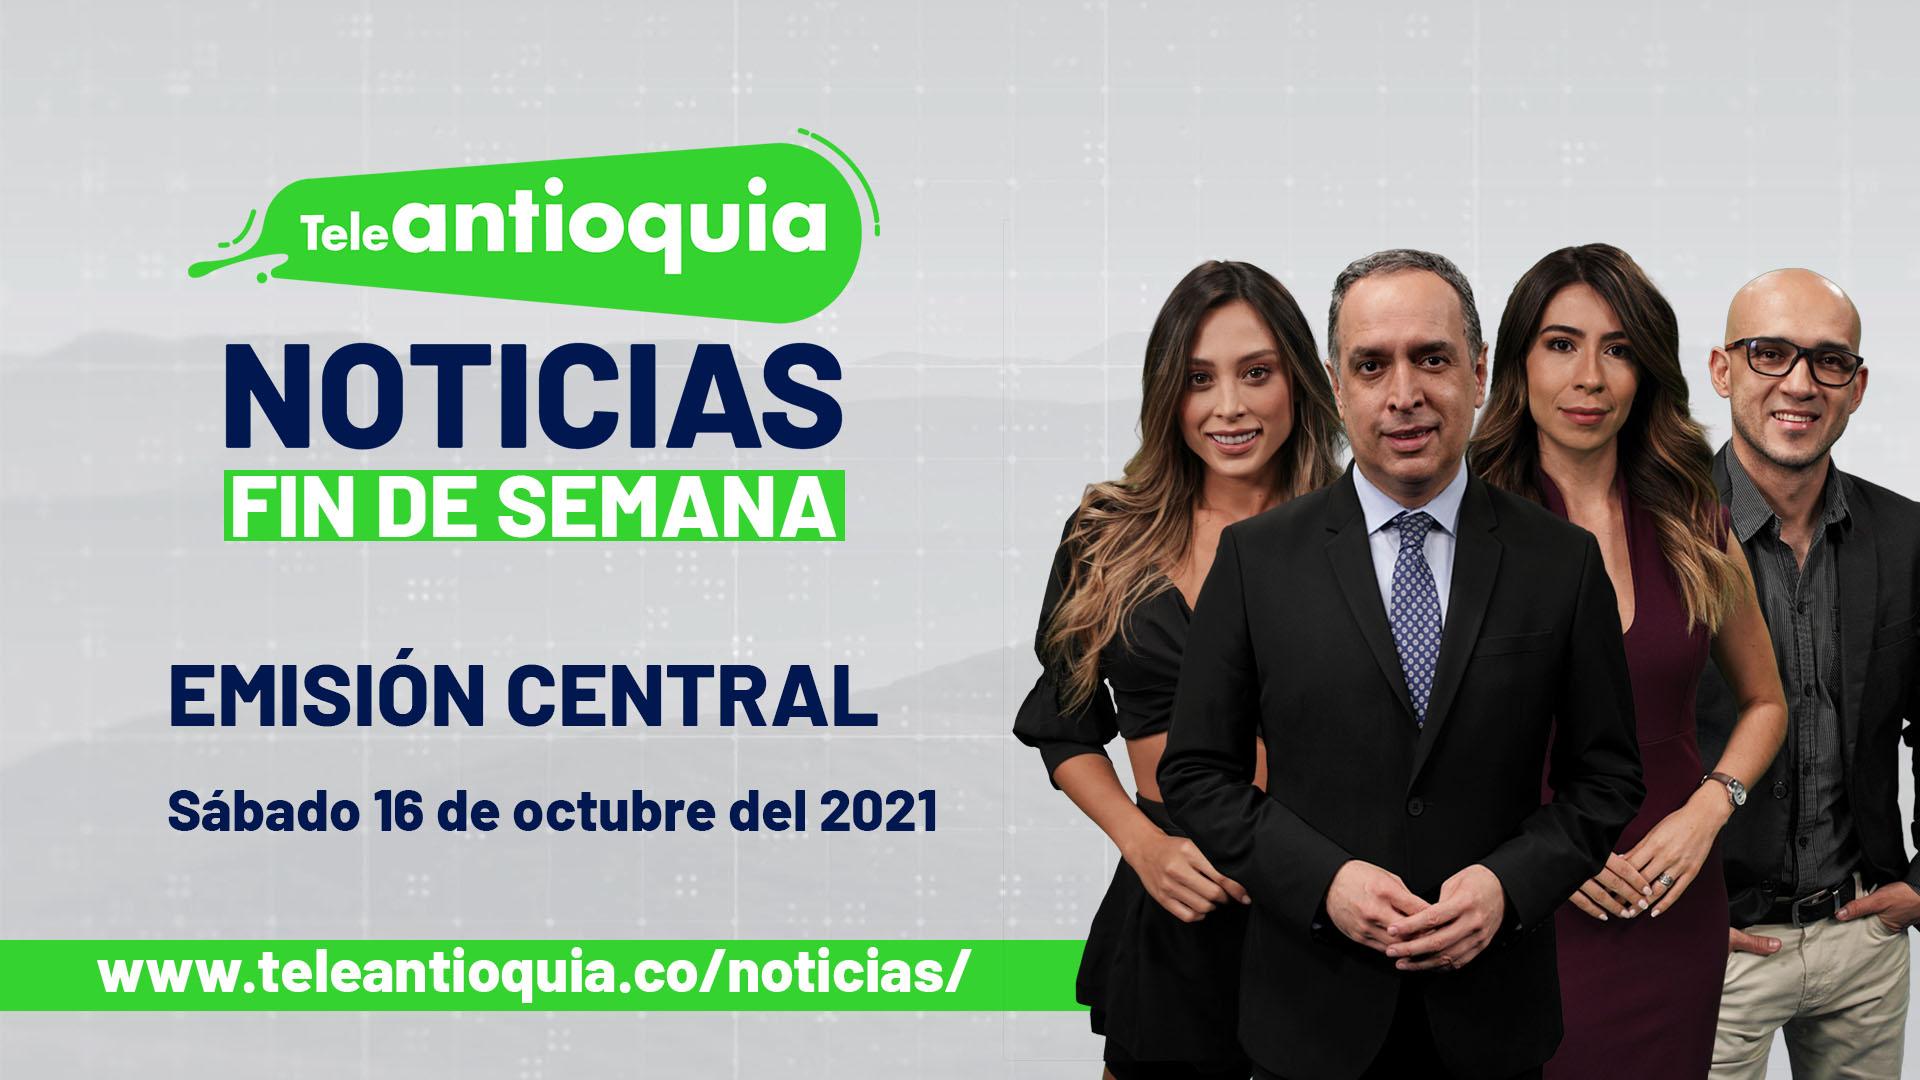 Teleantioquia Noticias - sábado 16 de octubre de 2021 noche